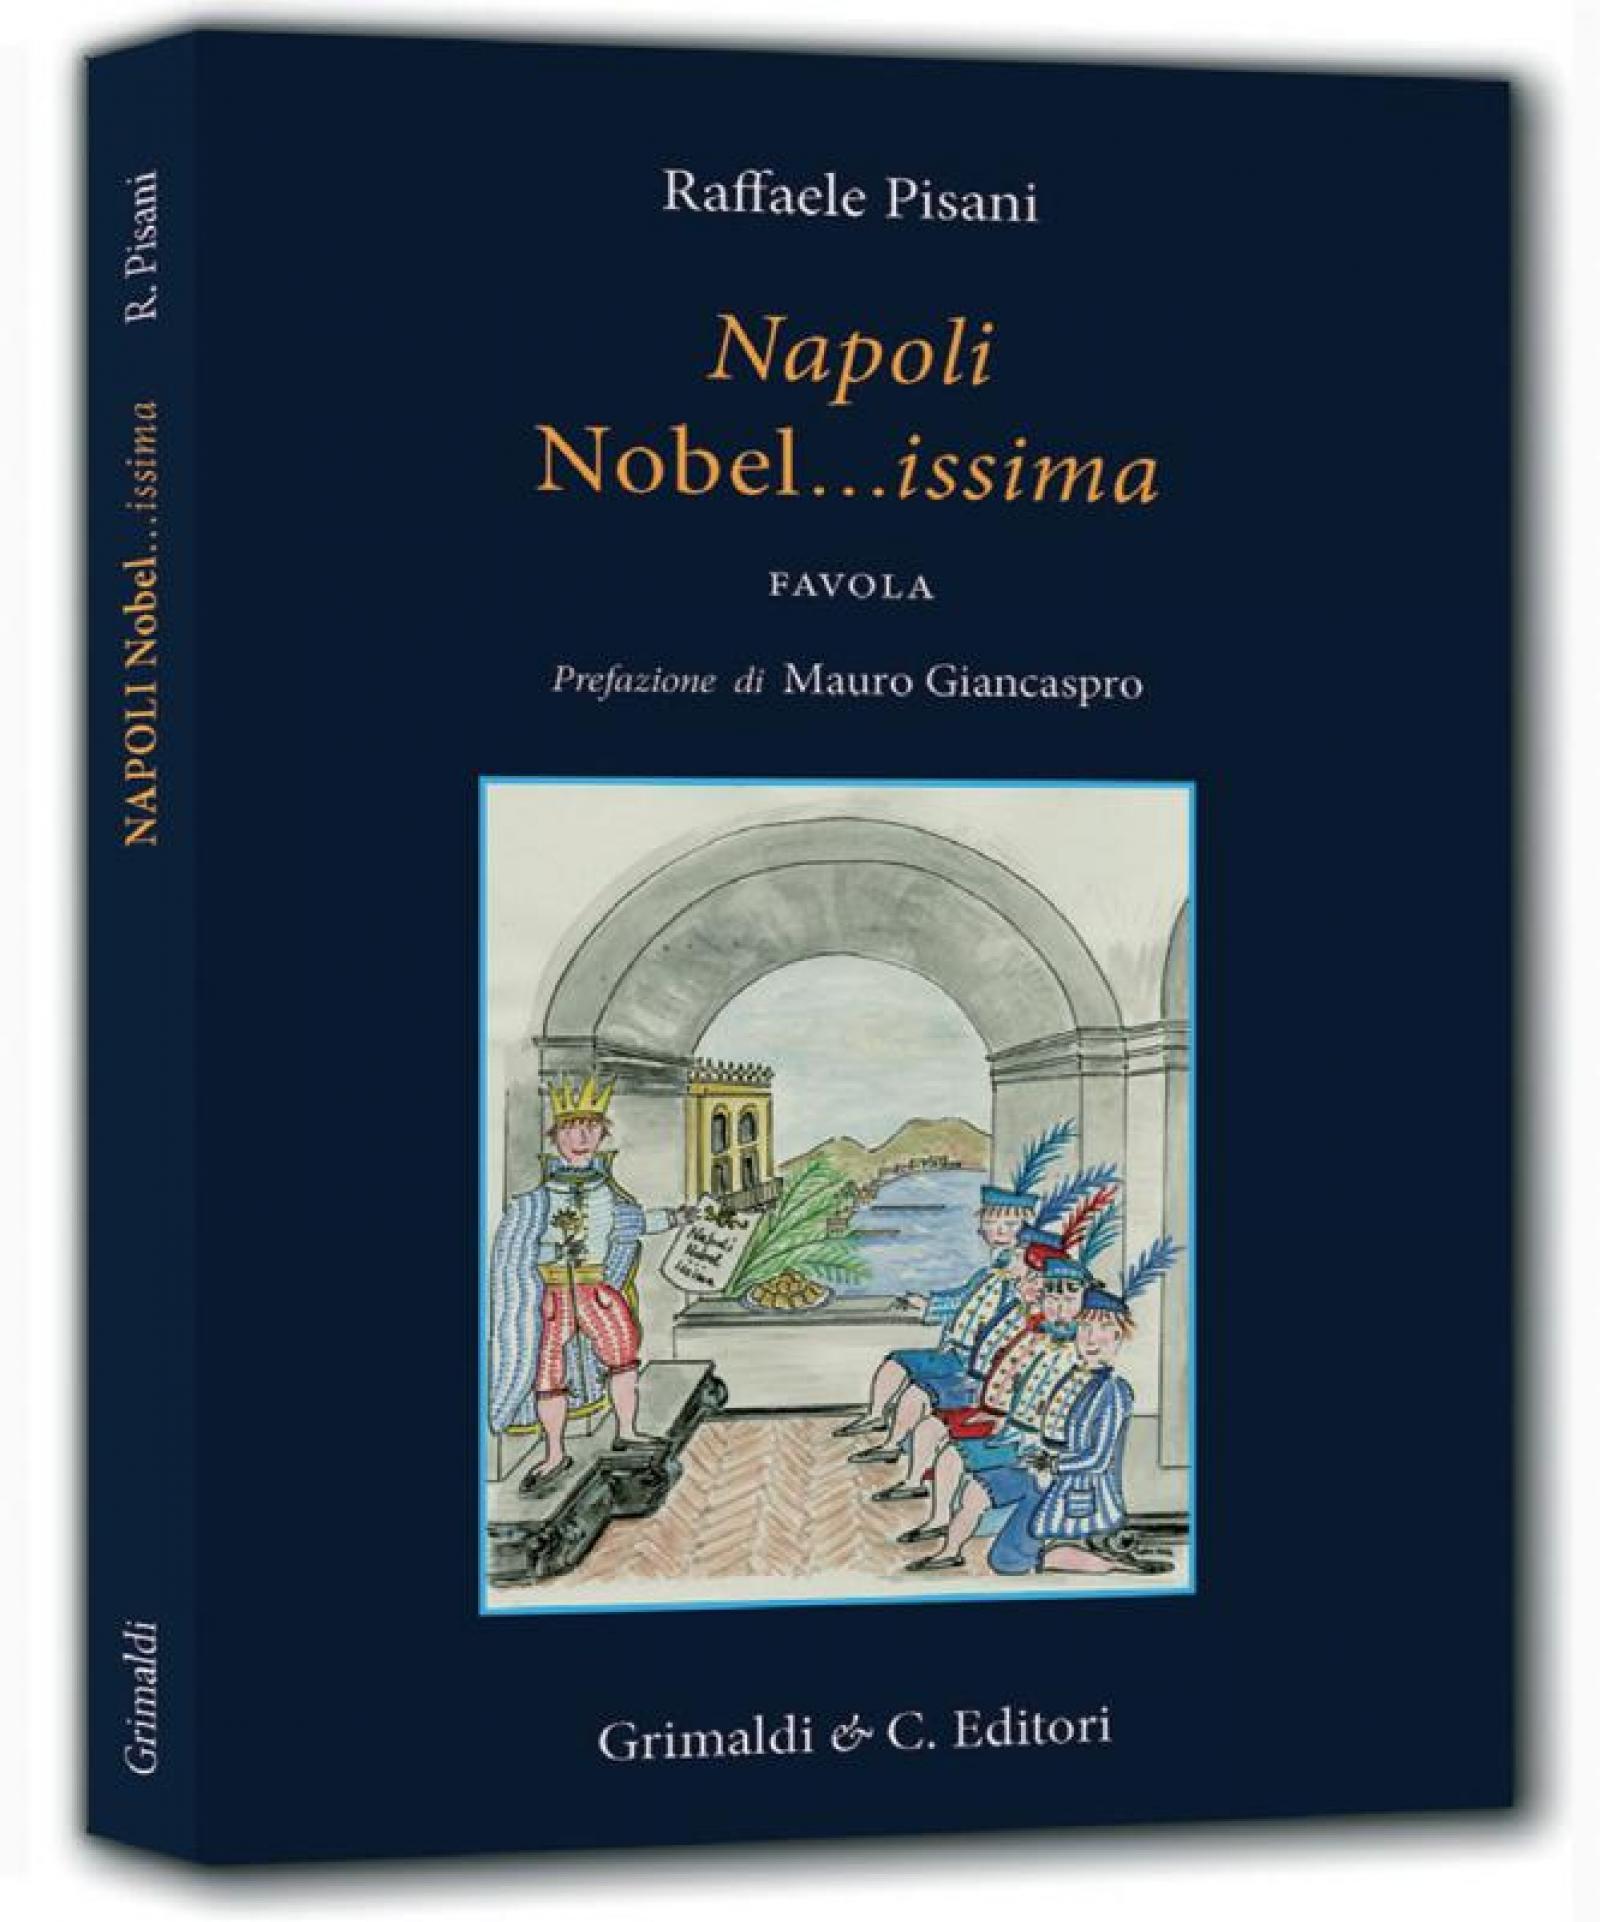 Napoli Nobel... issima